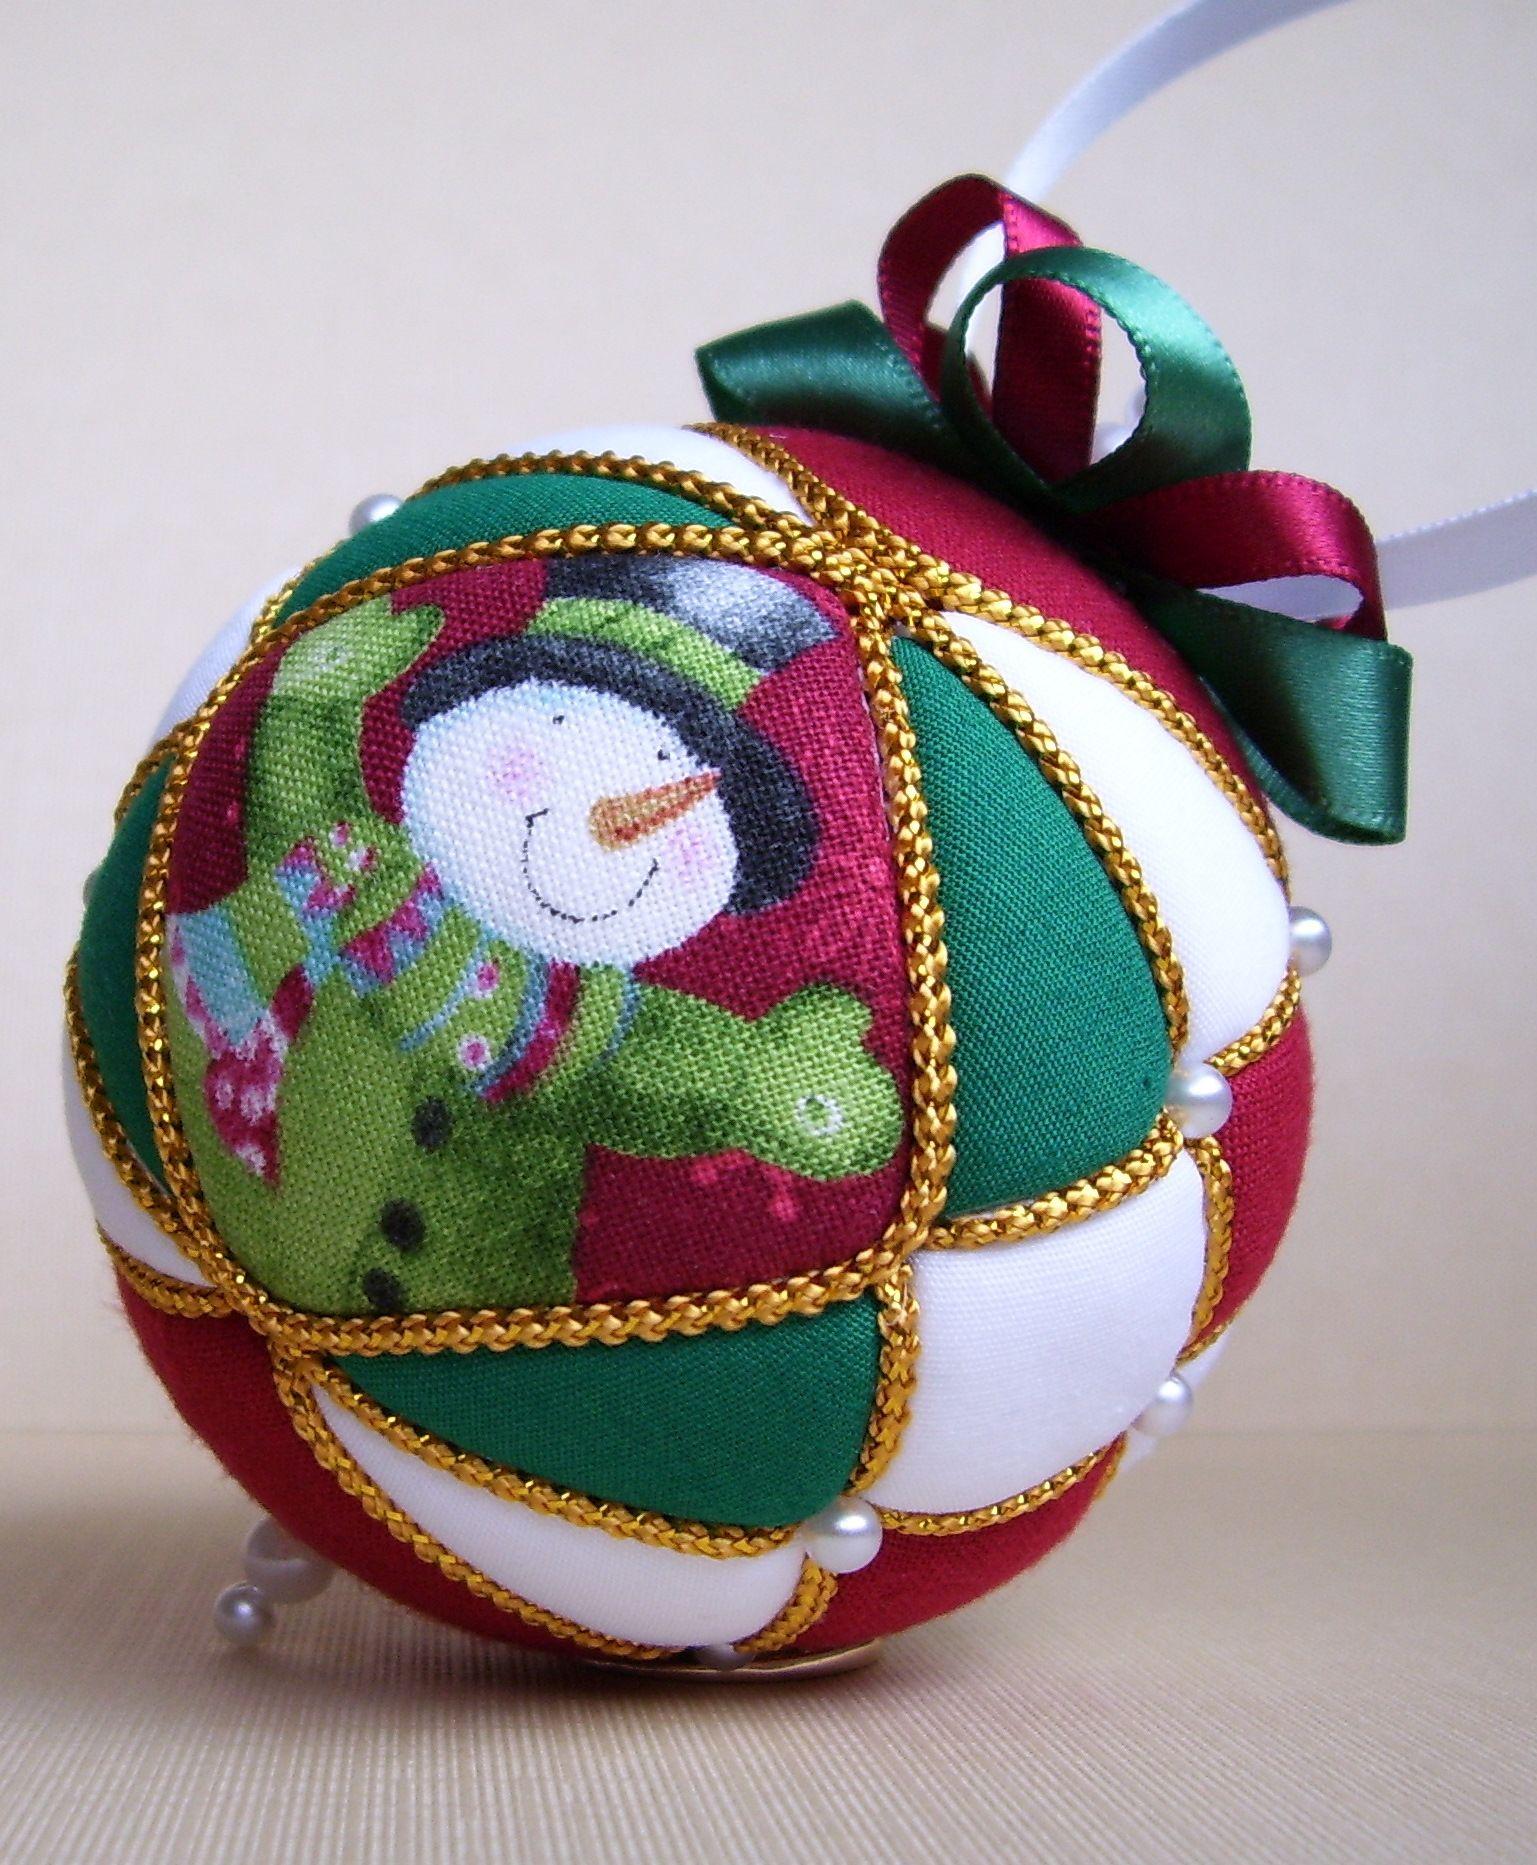 Snowman, 2012 | Fabric christmas ornaments, Christmas ...